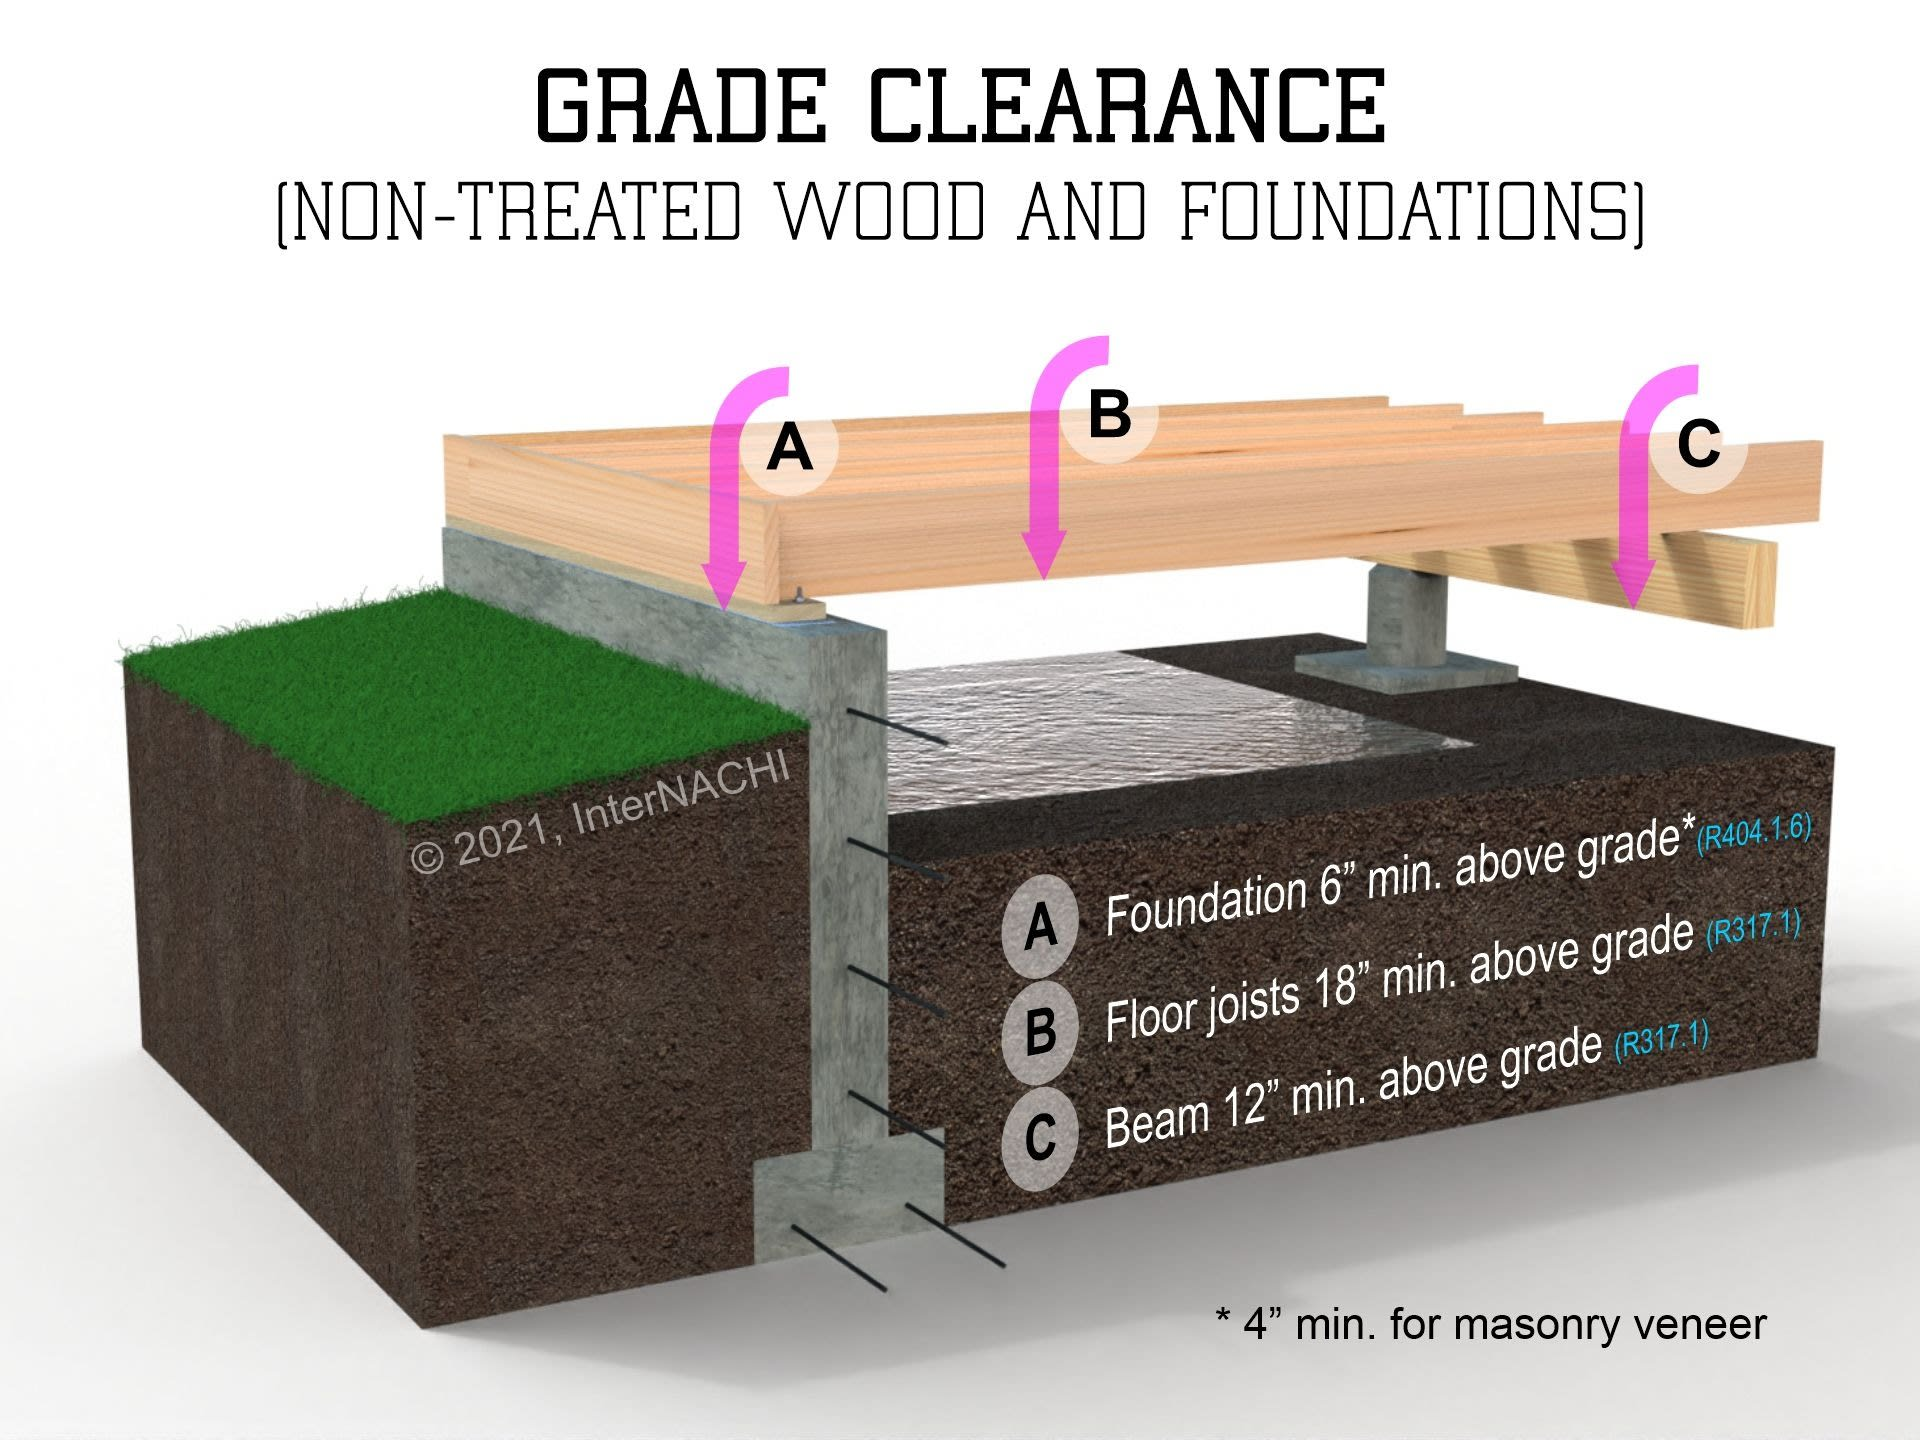 Grade clearance